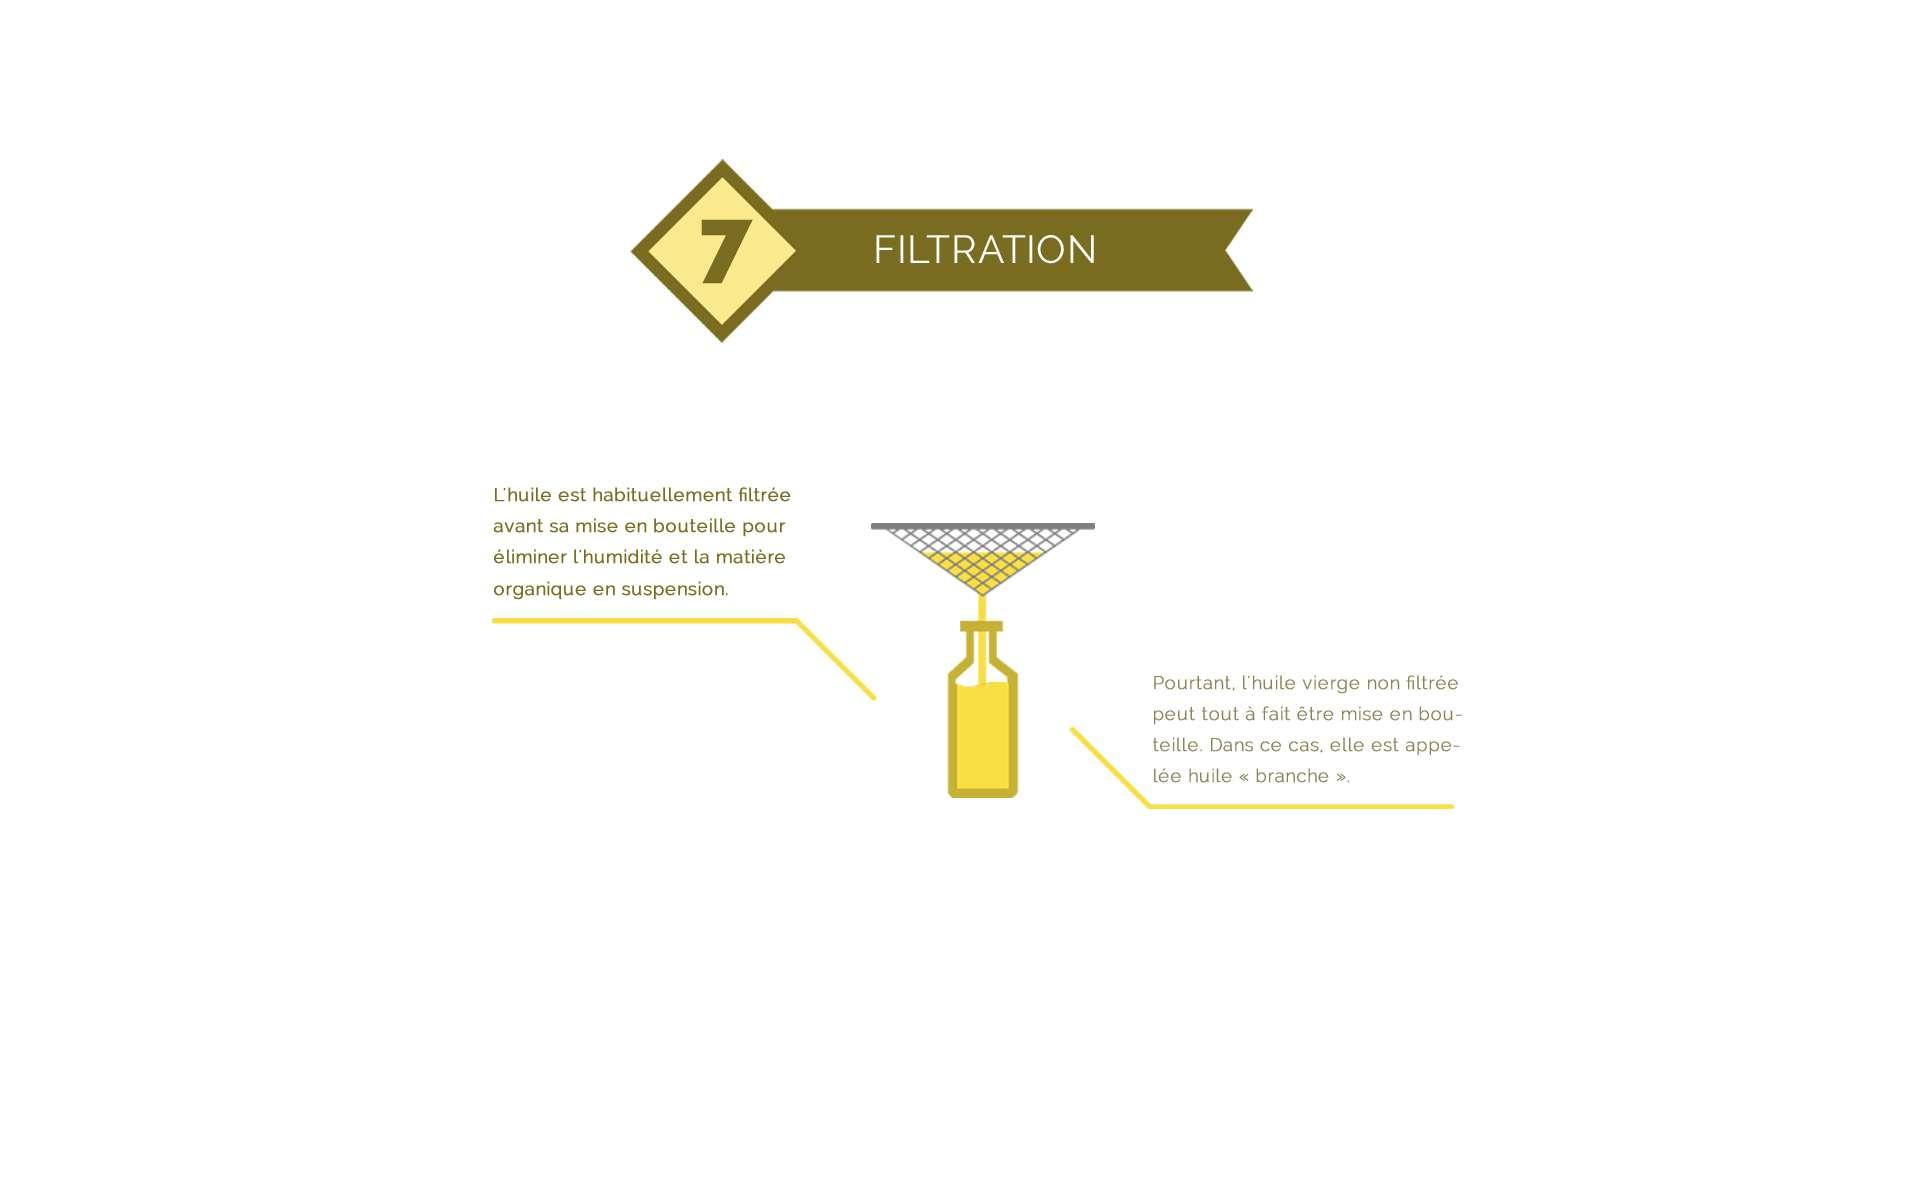 Filtration de l'huile d'olive